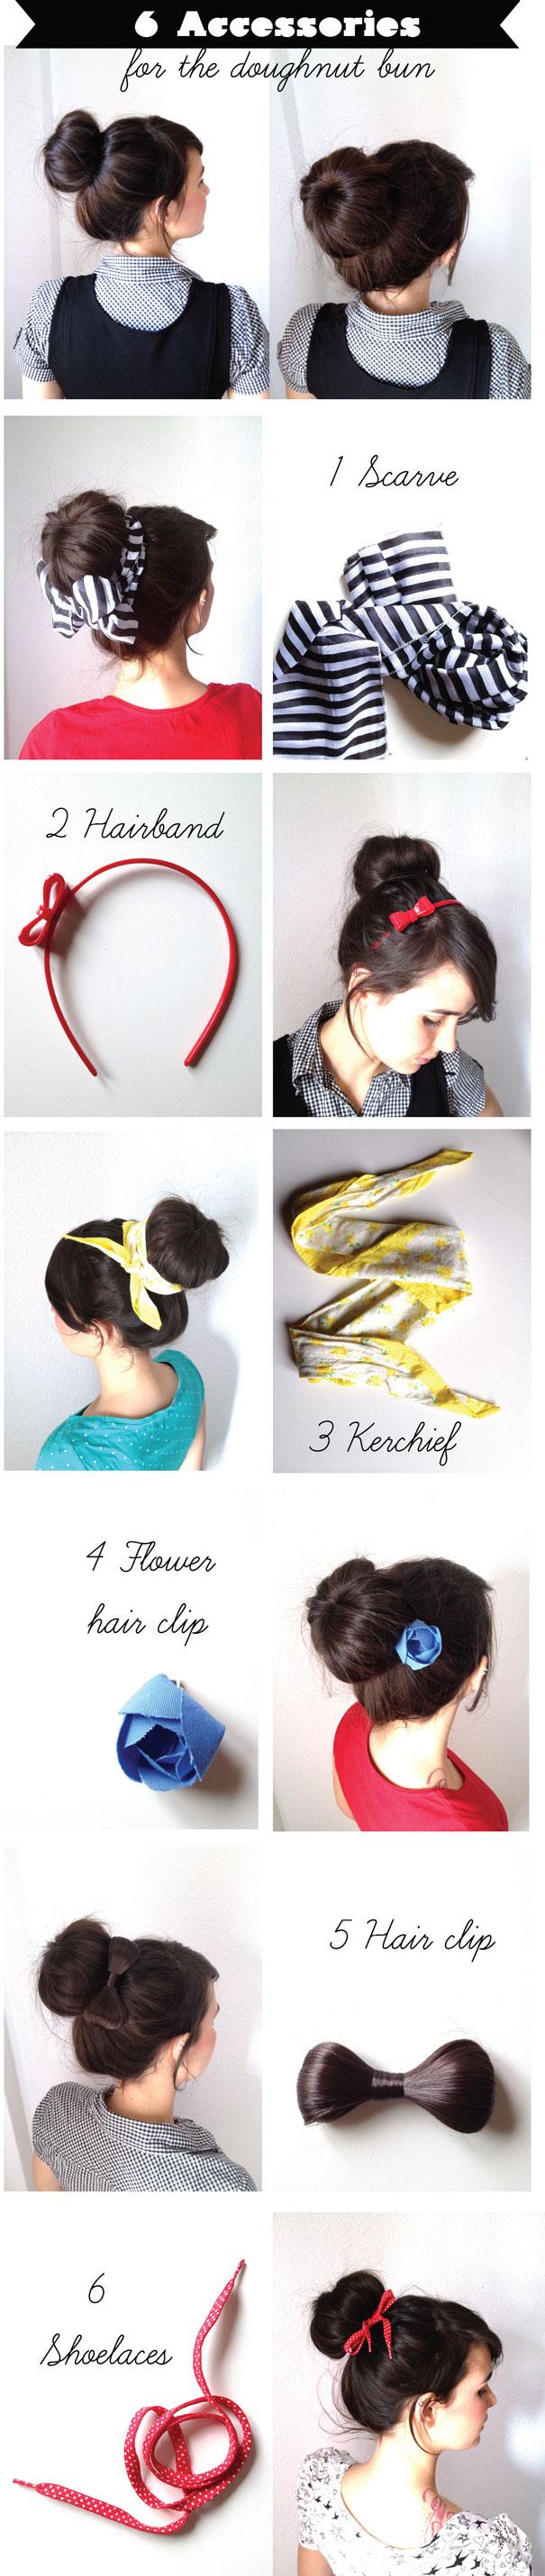 Communication on this topic: Twist Braid Updo Hairstyle Tutorial: Maiden Hairstyles, twist-braid-updo-hairstyle-tutorial-maiden-hairstyles/